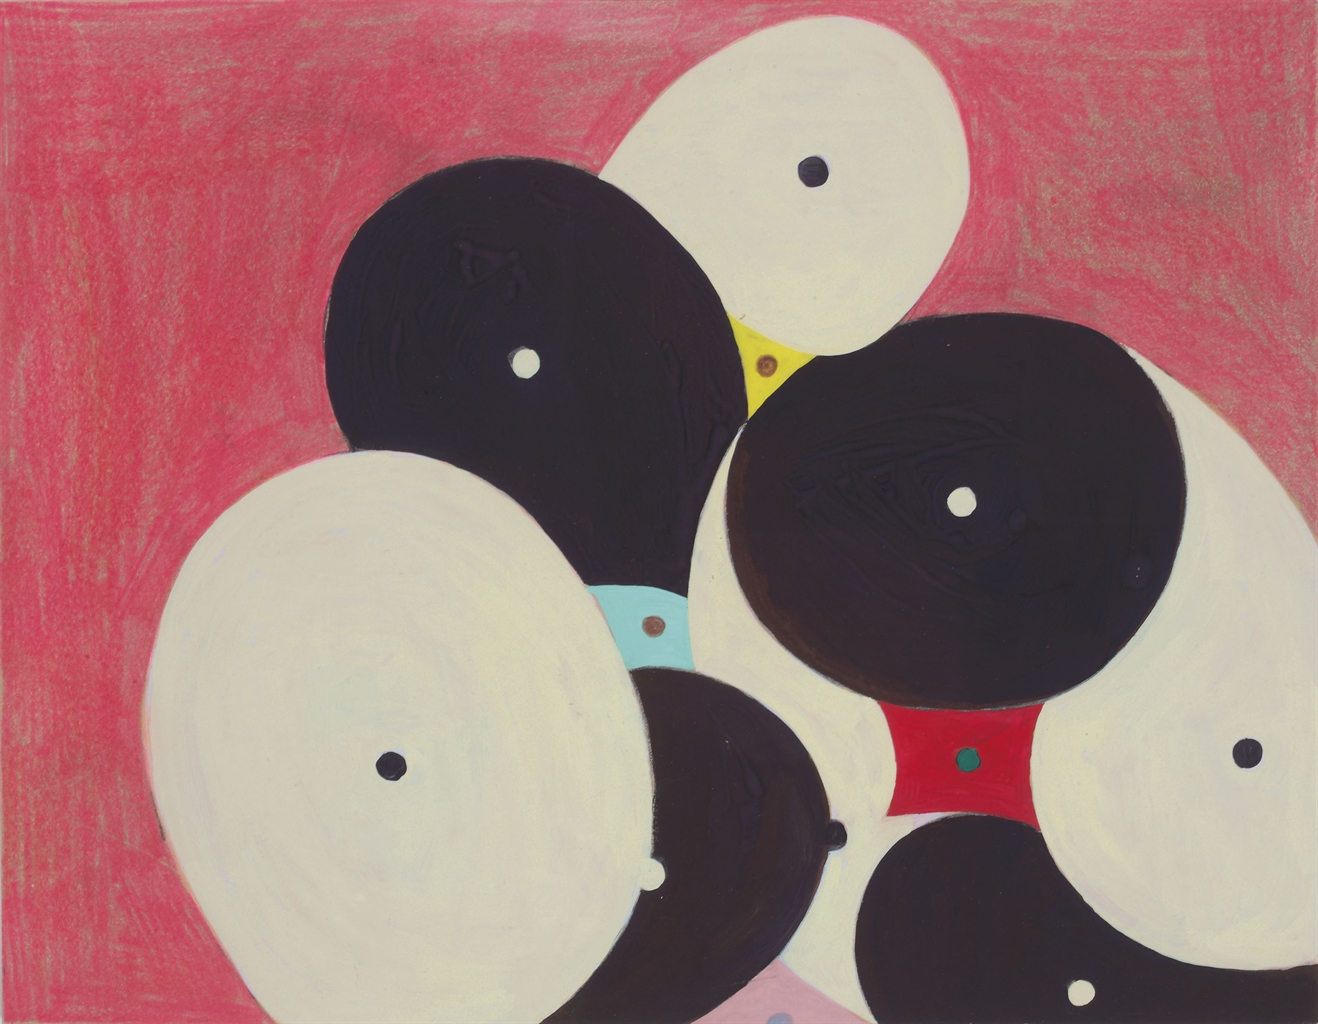 Thomas Nozkowski-Untitled (M-7)-2006